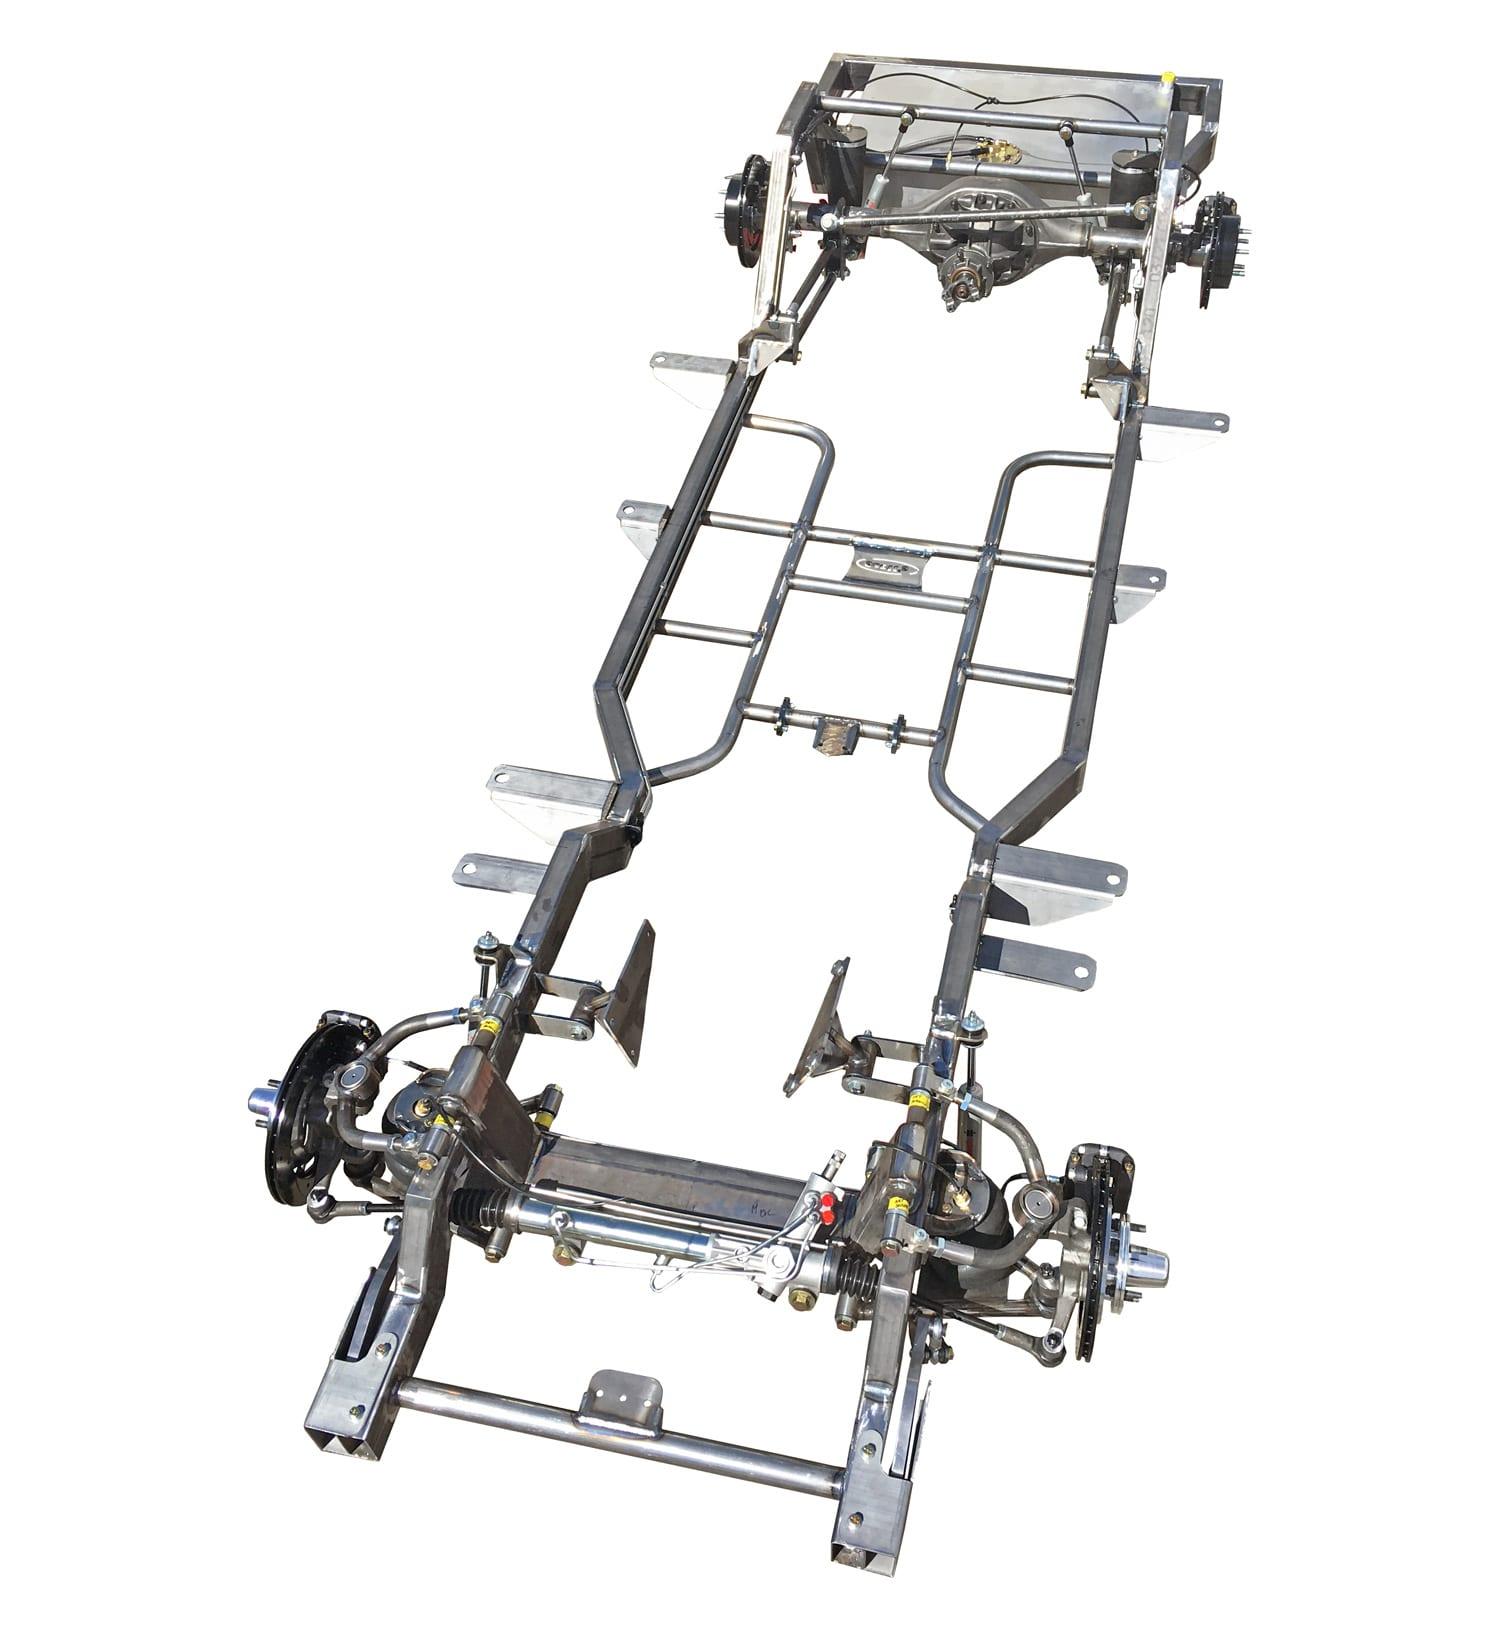 scotts-hotrods-1949-1951-mercury-chassis-2